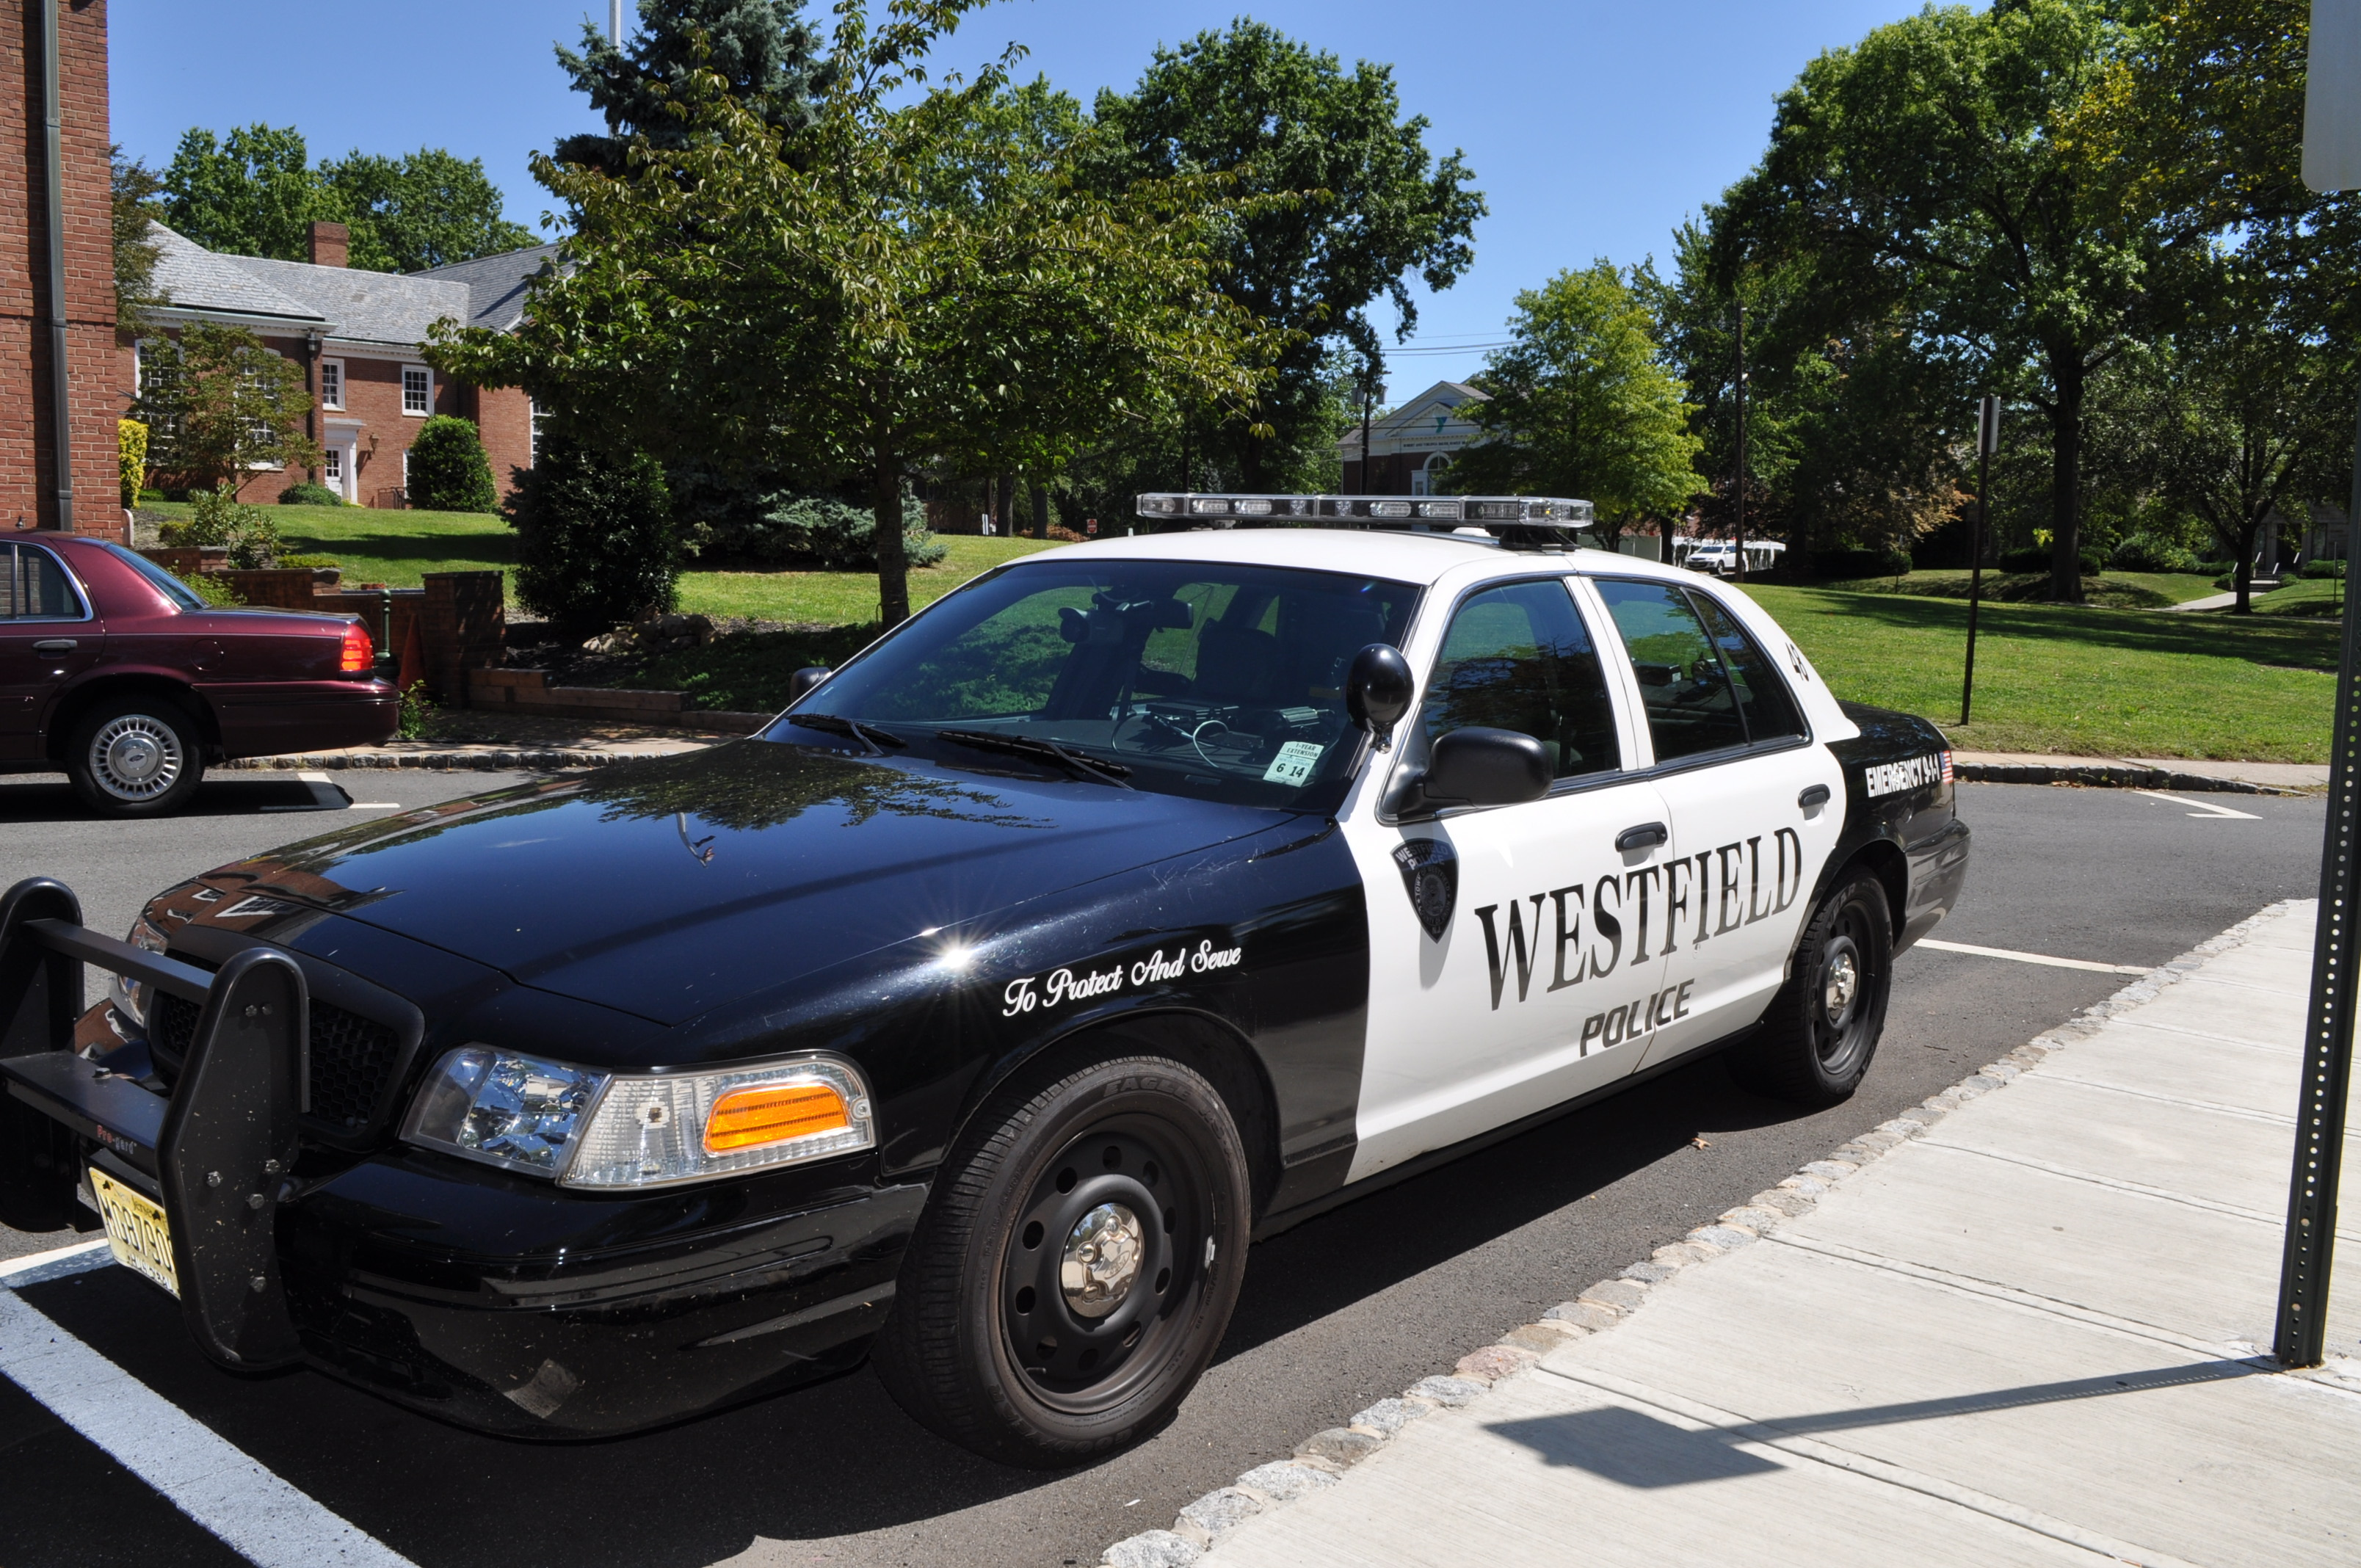 0a7b983c4602031aa6fc_police_car.JPG